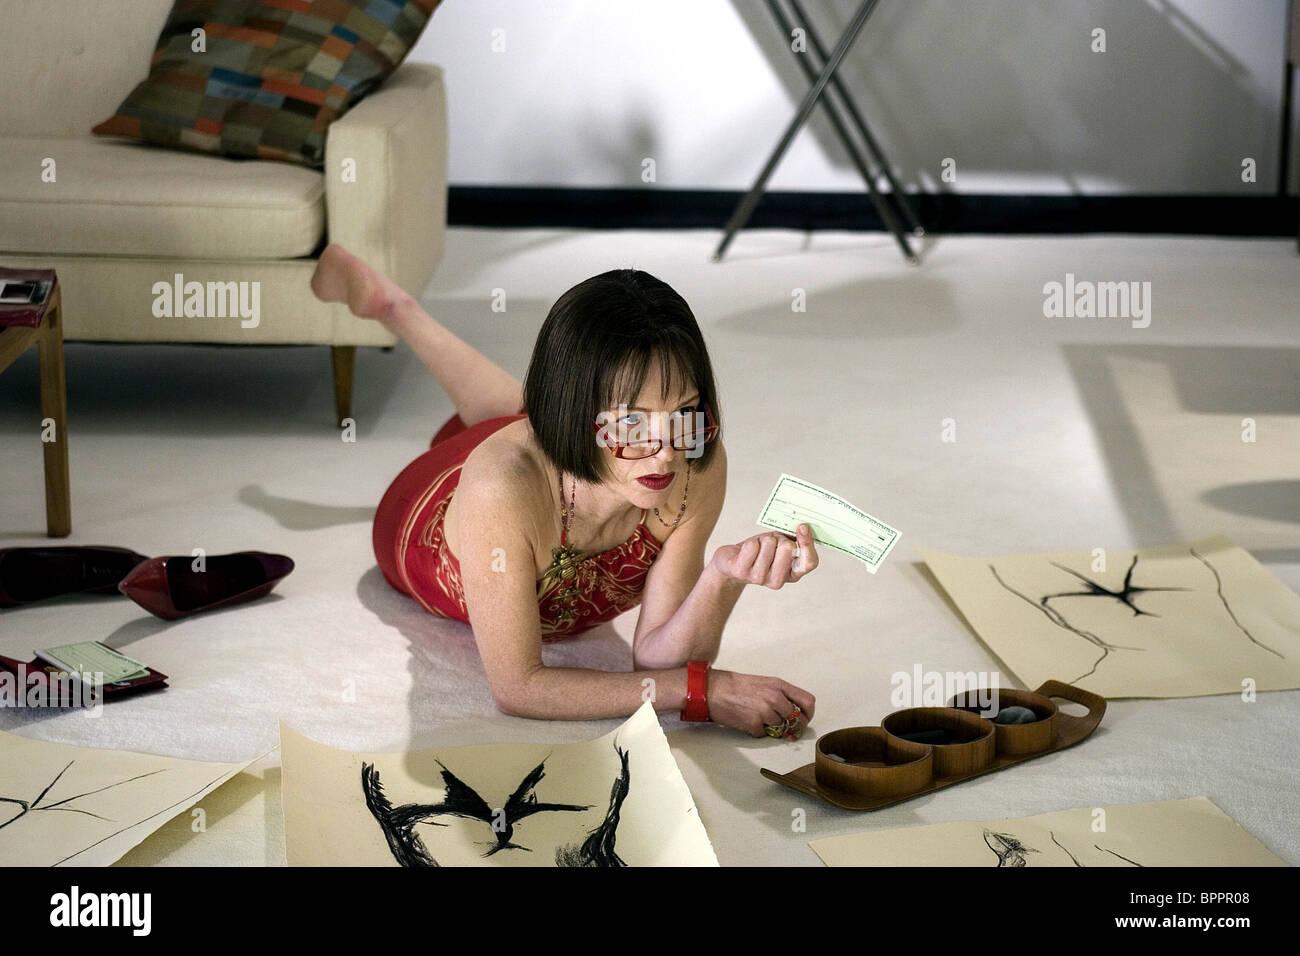 Judy Davis The Break Up 2006 Stock Photo Alamy